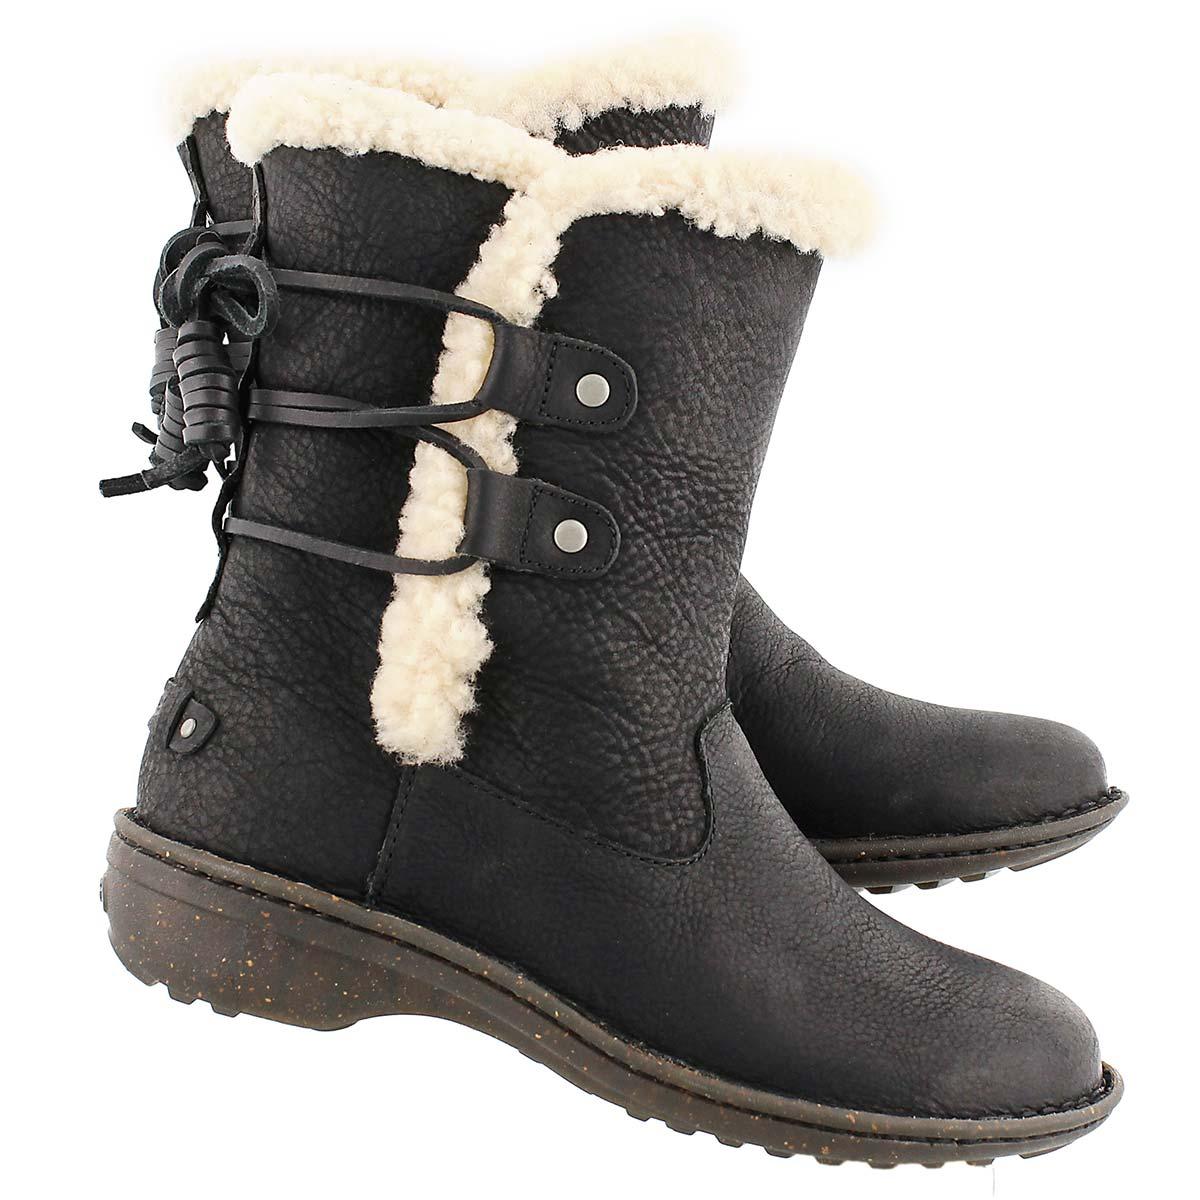 Lds Akadia black sheepskin winter boot